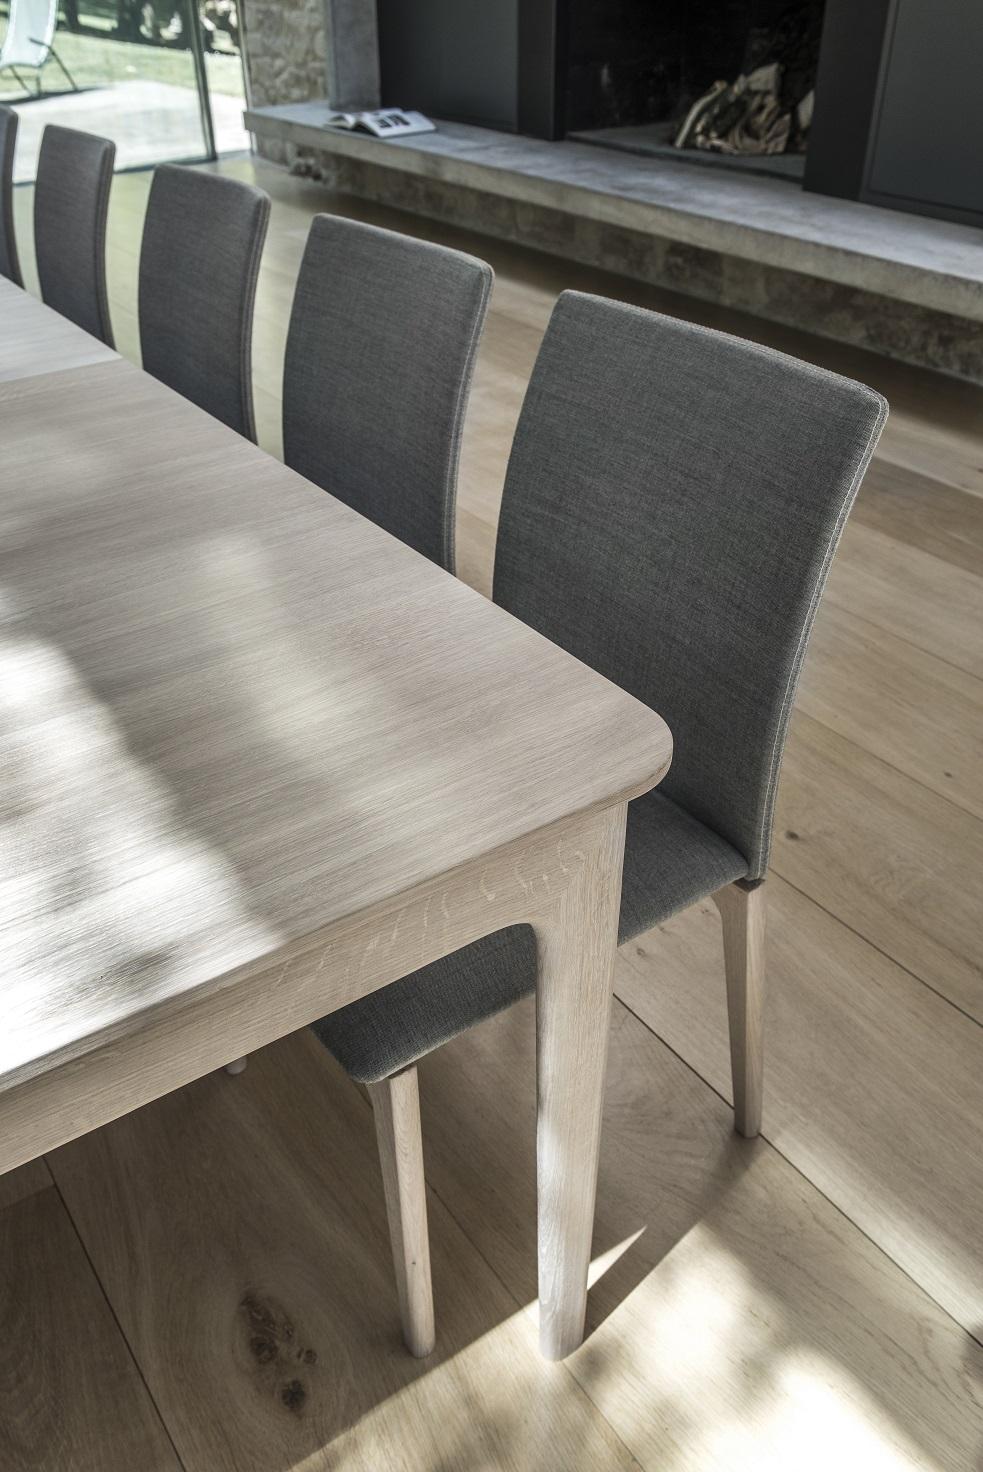 Nytt Skovby SM 27 spisebord - Danbo Møbler OY-06